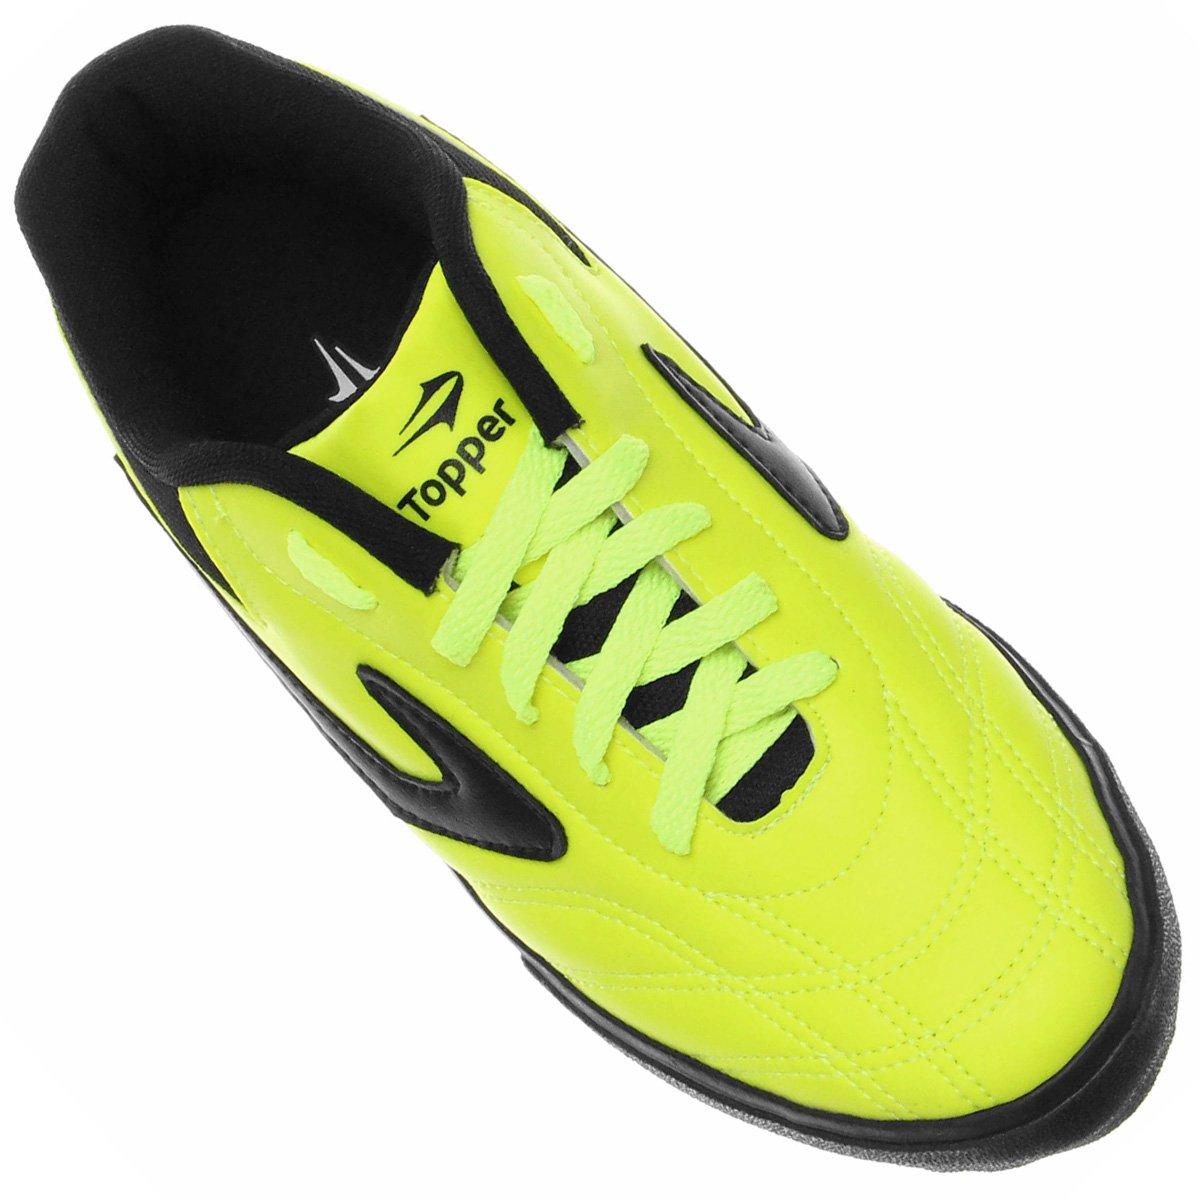 4bec9066c1 Chuteira Futsal Topper Dominator 3 - Preto - Compre Agora